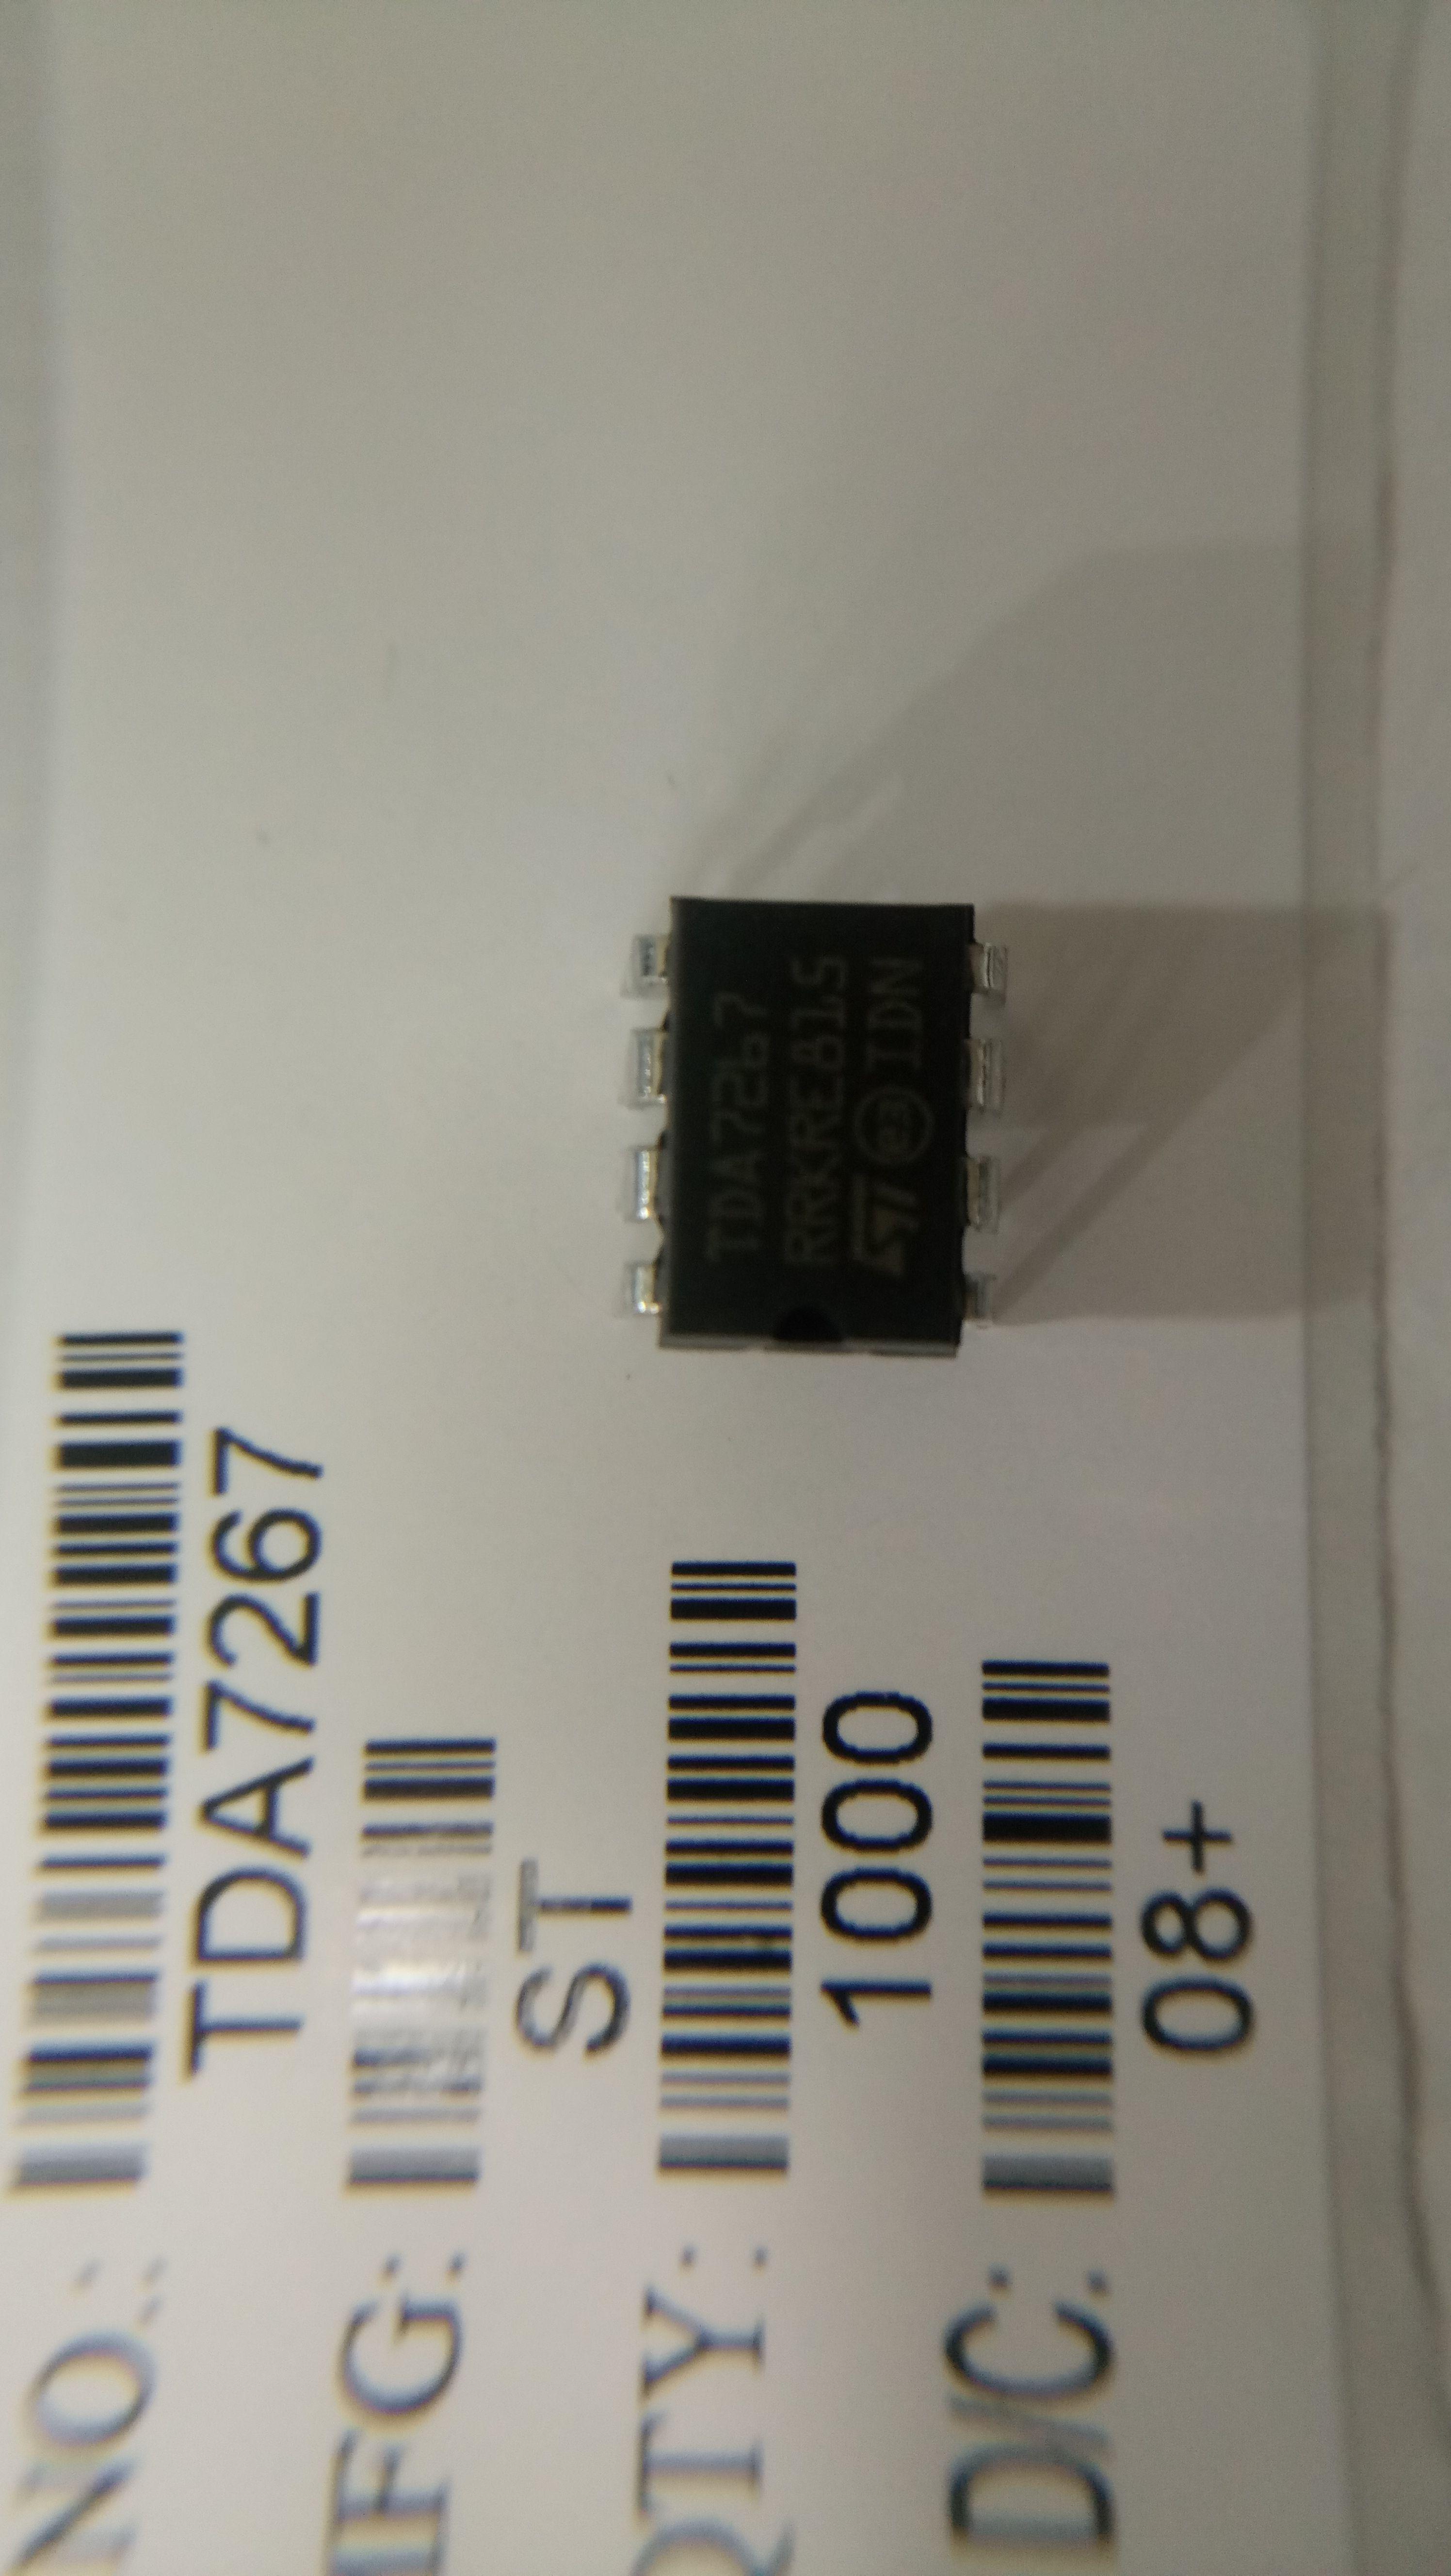 10PCS TDA7267 PDIP-8 original STMicroelectronics 2w Mono audio Amplifier  One-stop distribution of electronic components Accept ROM e-shop